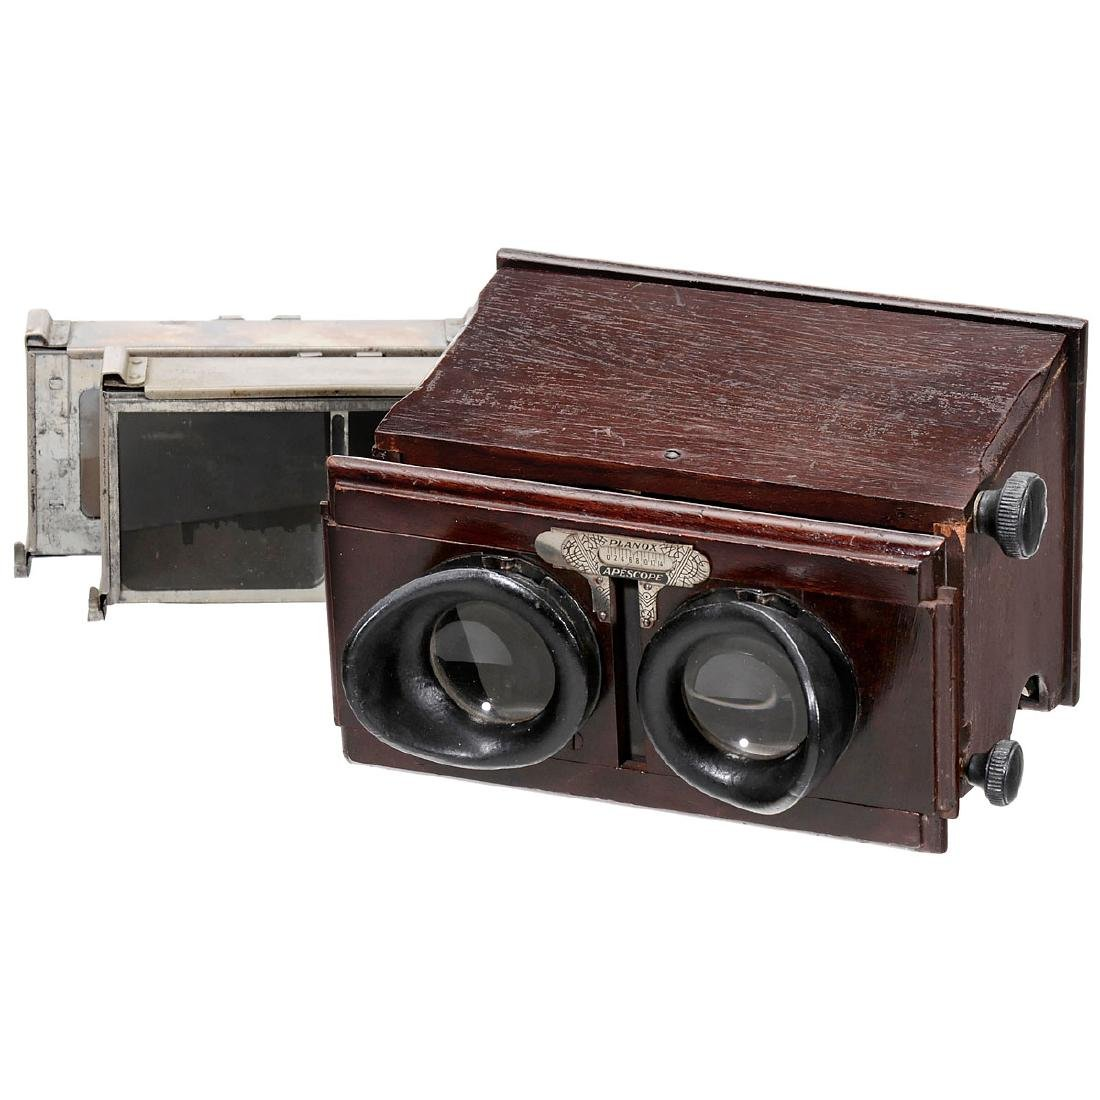 Planox Apescope 6 x 13 and 45 x 107, c. 1925